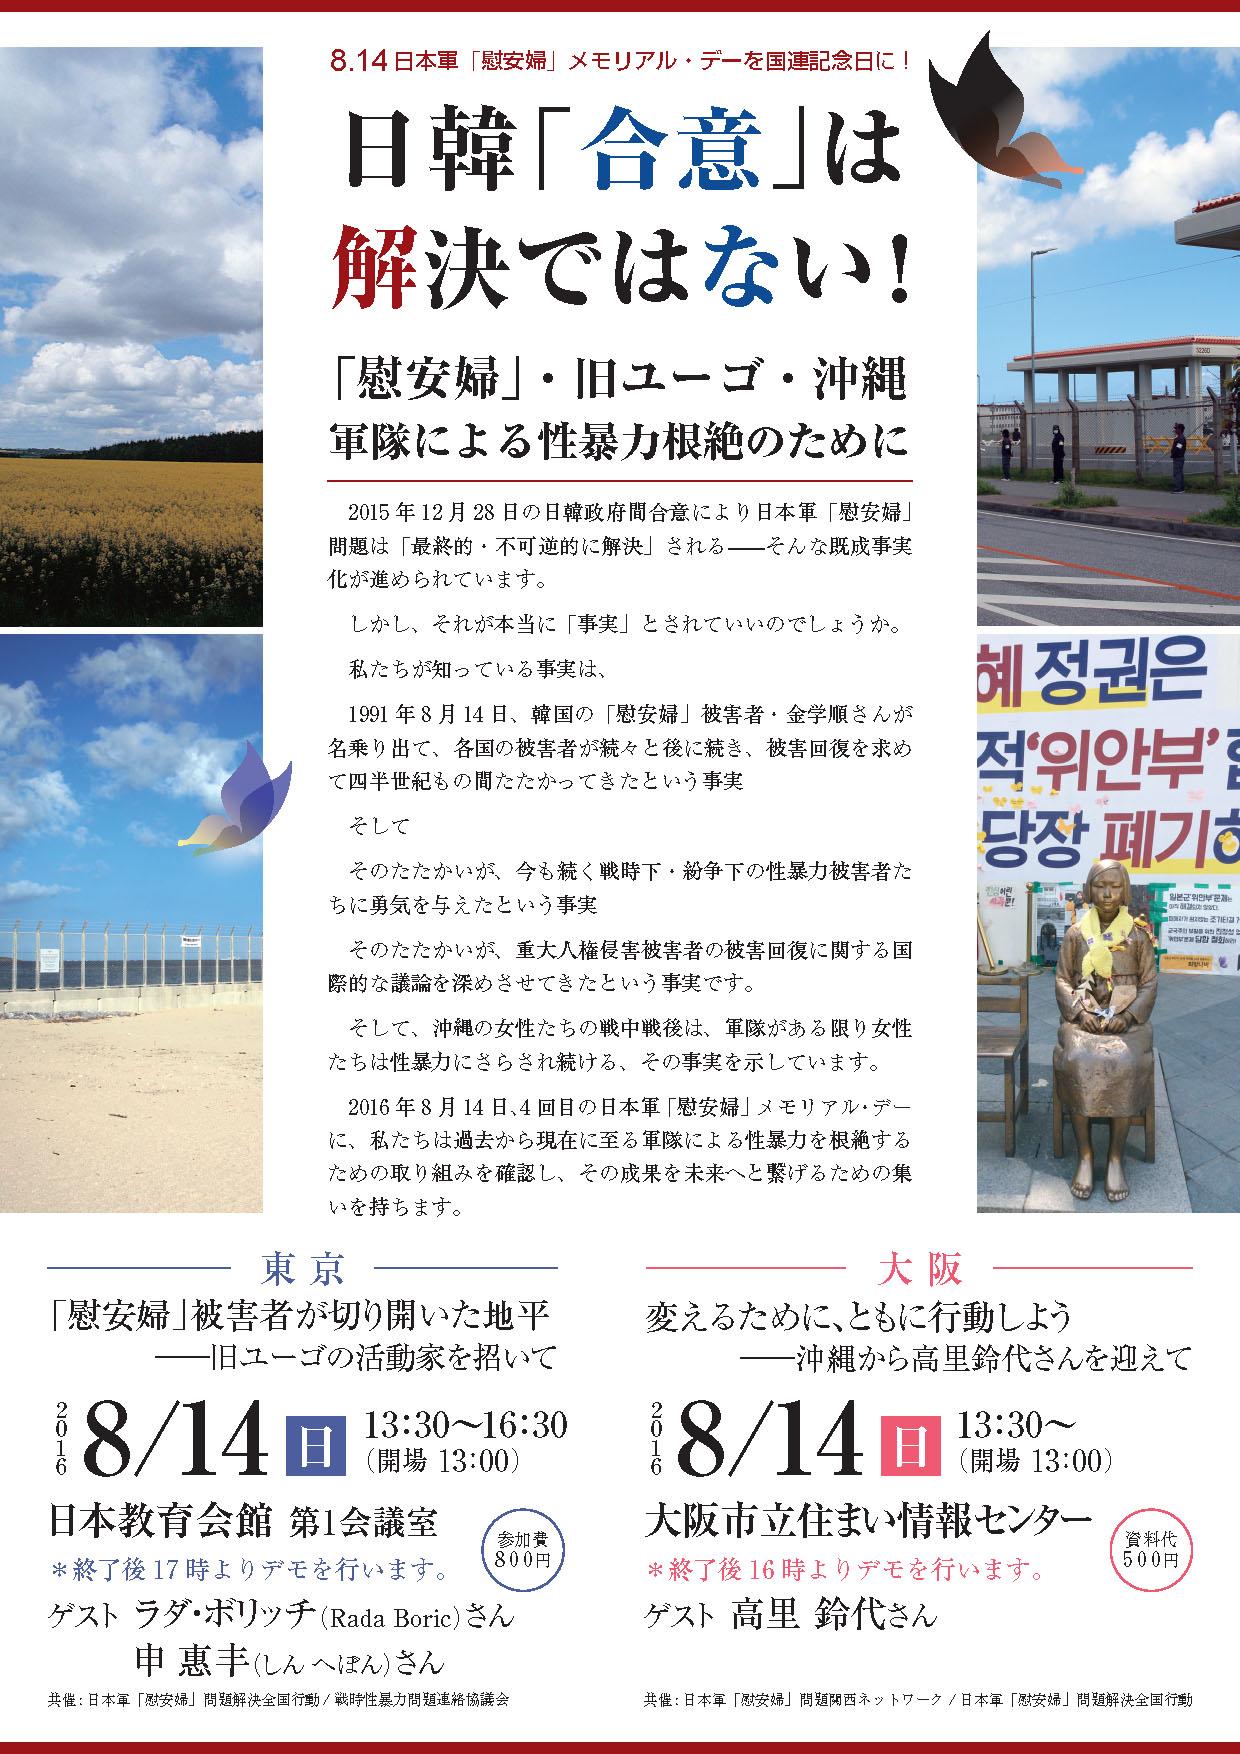 2016-08-14_o.jpg